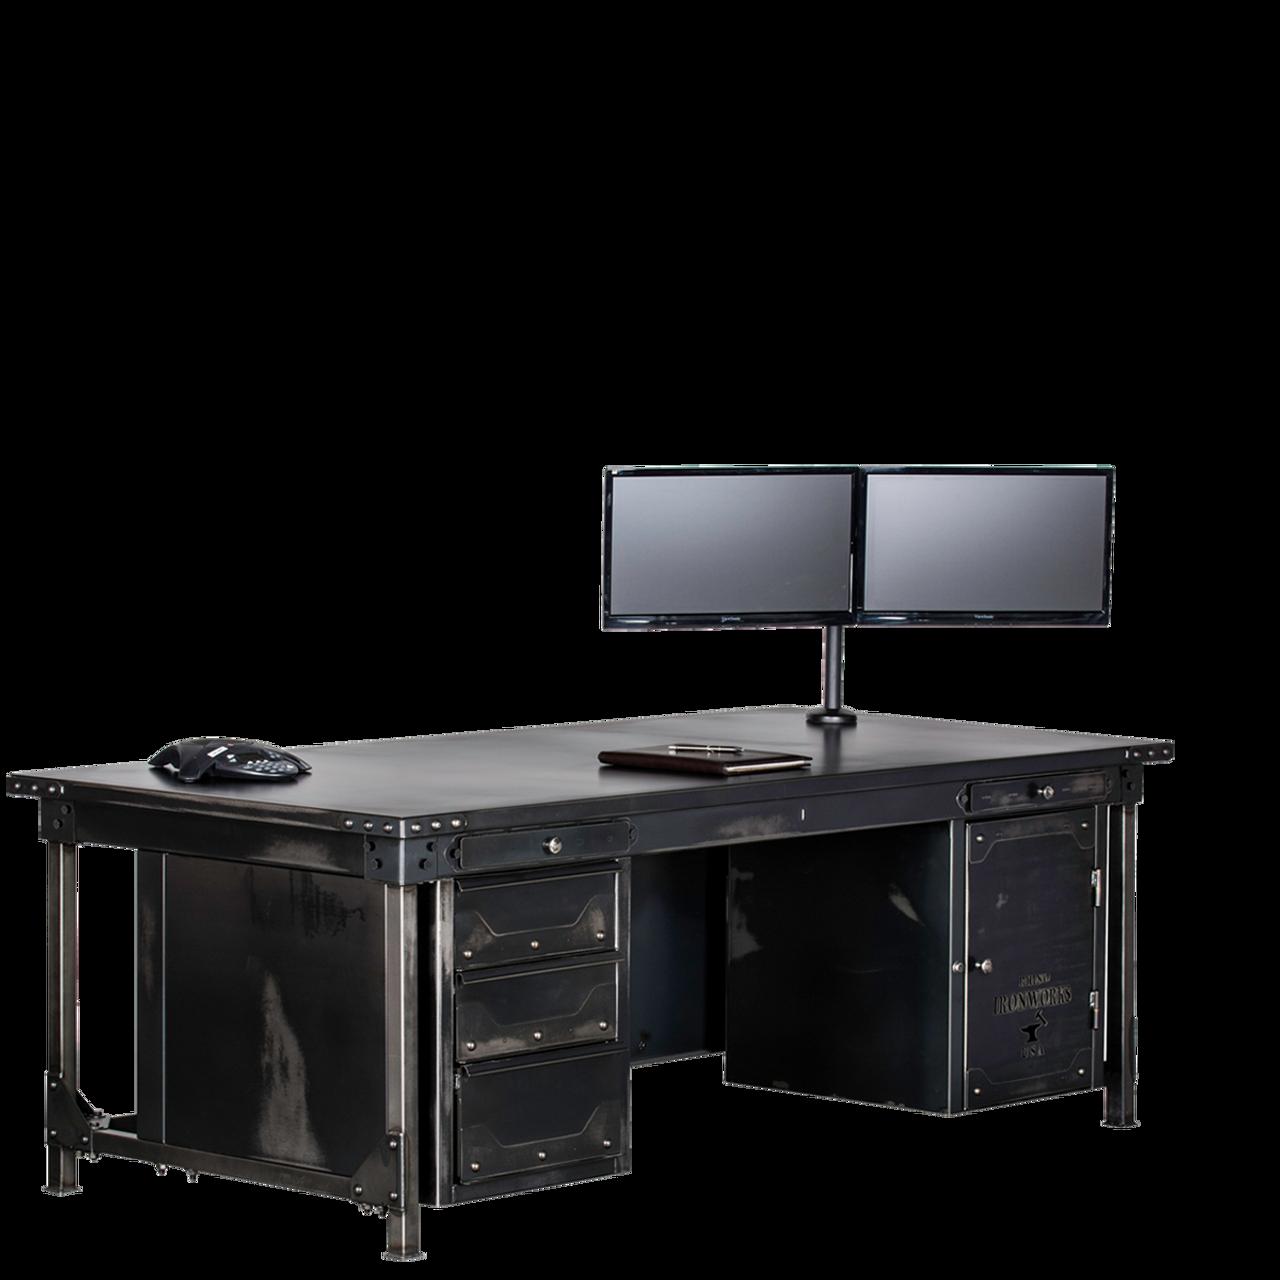 rhino office furniture. Ironworks Executive Desk Rhino Office Furniture